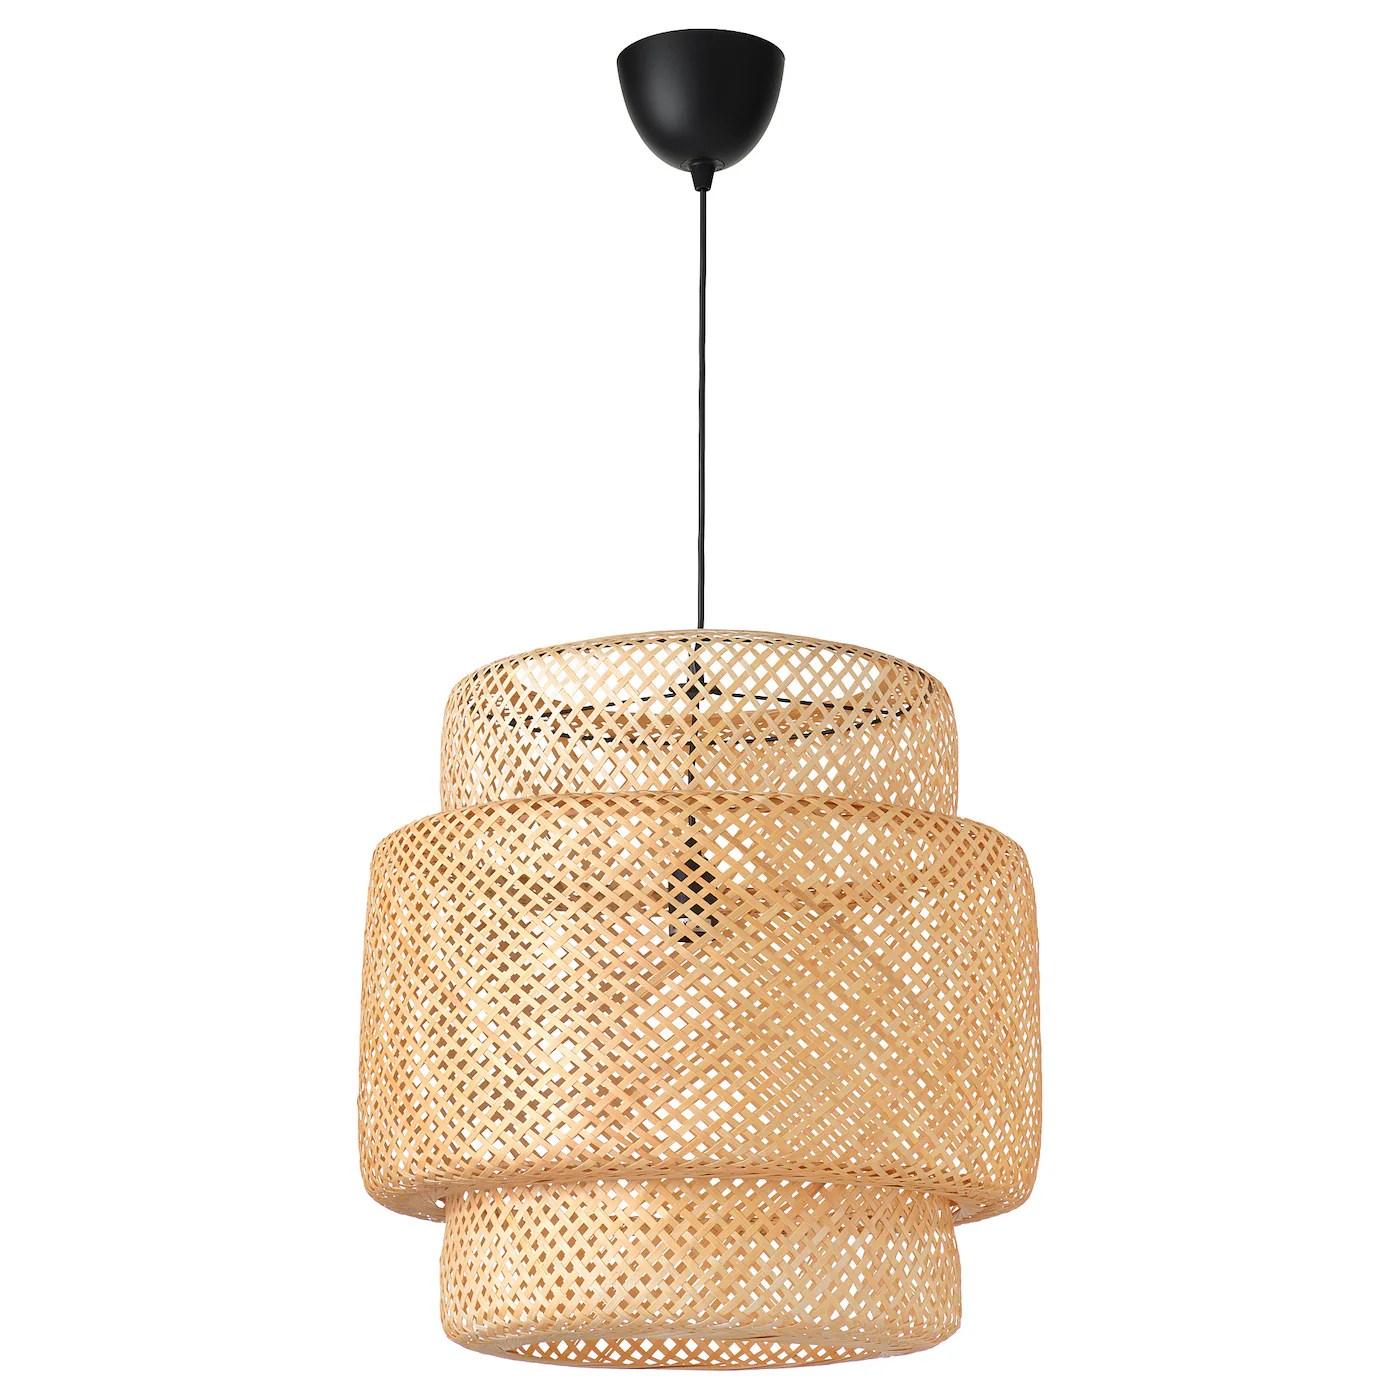 Sinnerlig Suspension Bambou Materiau Durable Ikea